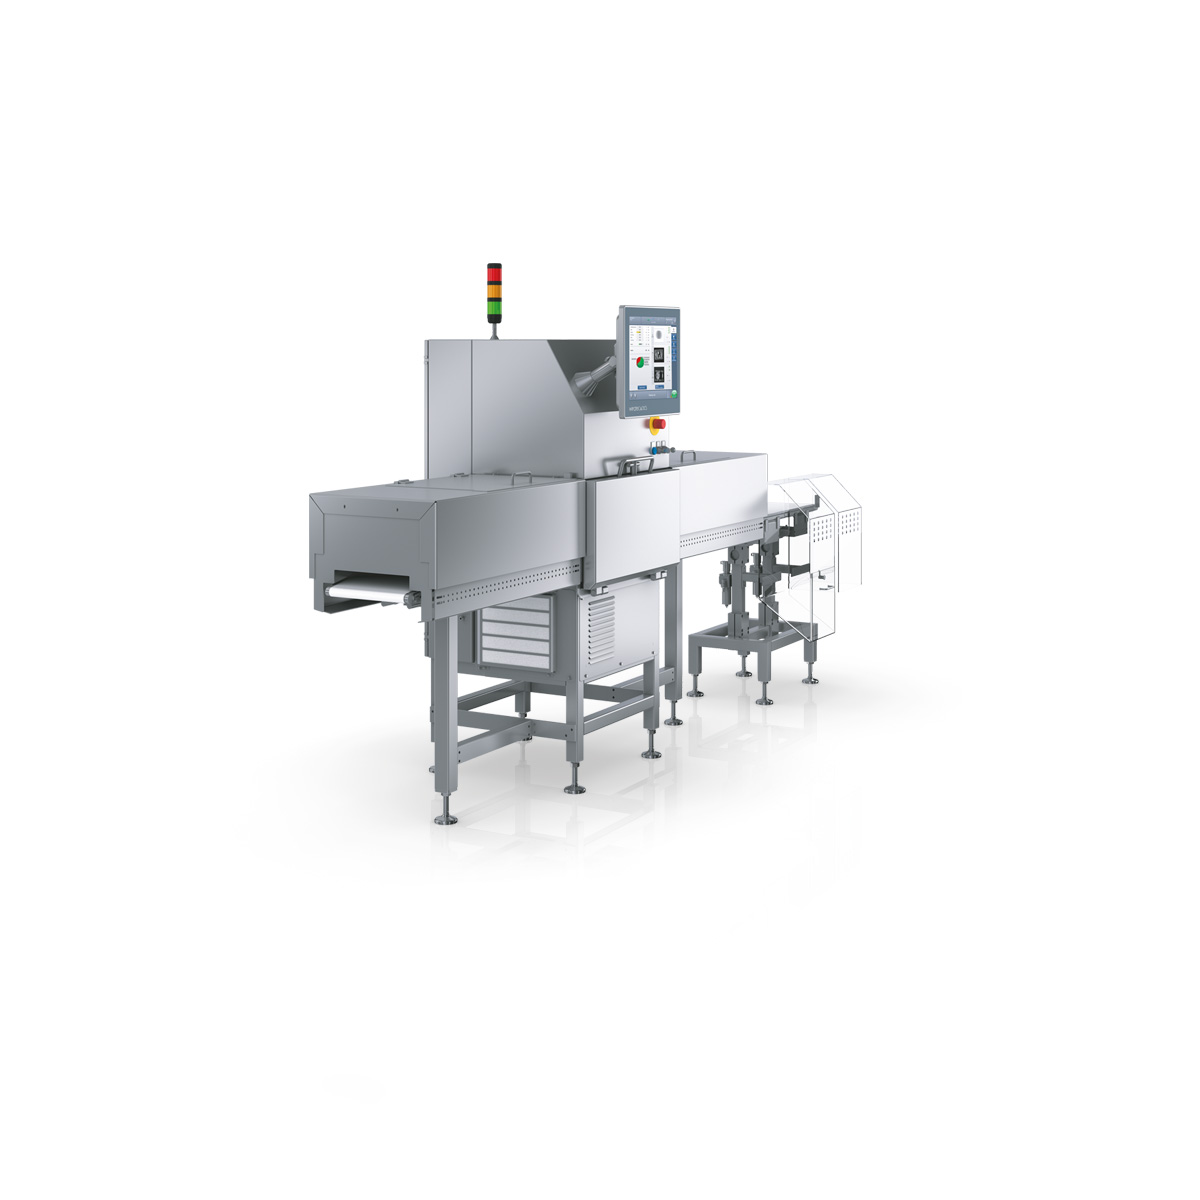 x-ray-inspection-vision-inspection-system-sc-v-left-view-v2